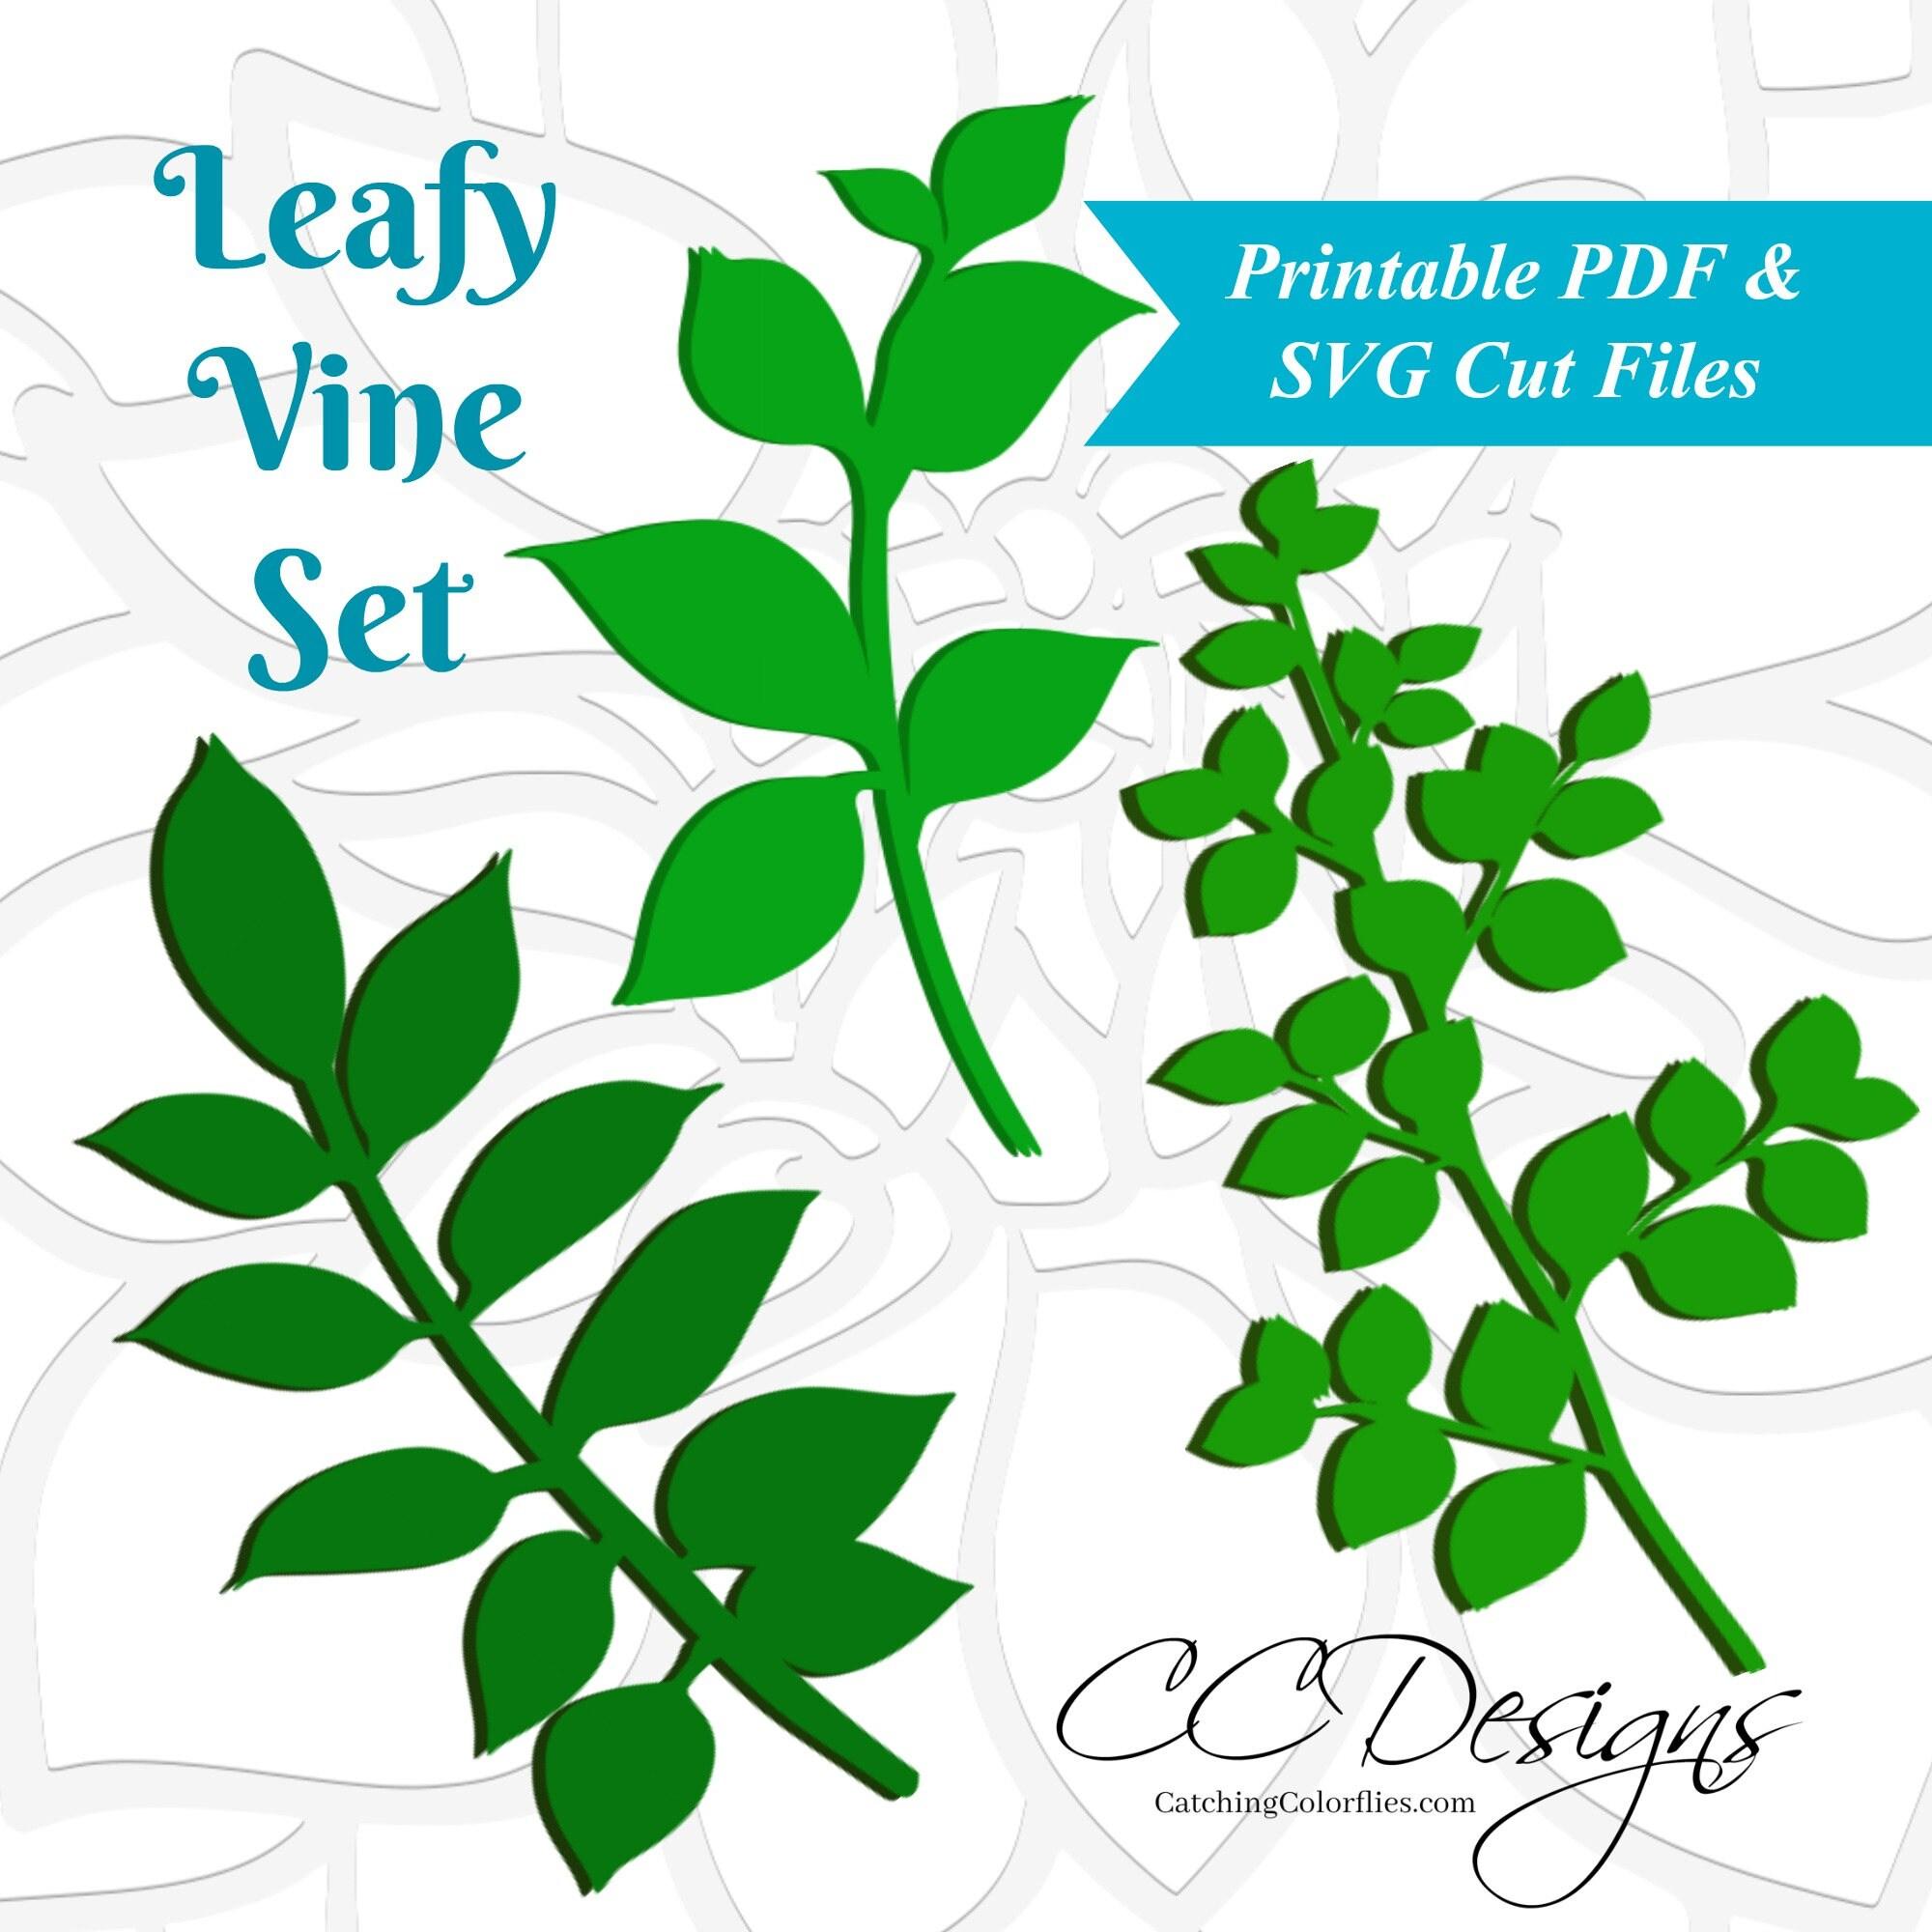 Leaf SVG Template Leafy Vine Set SVG cut files Vine Cut